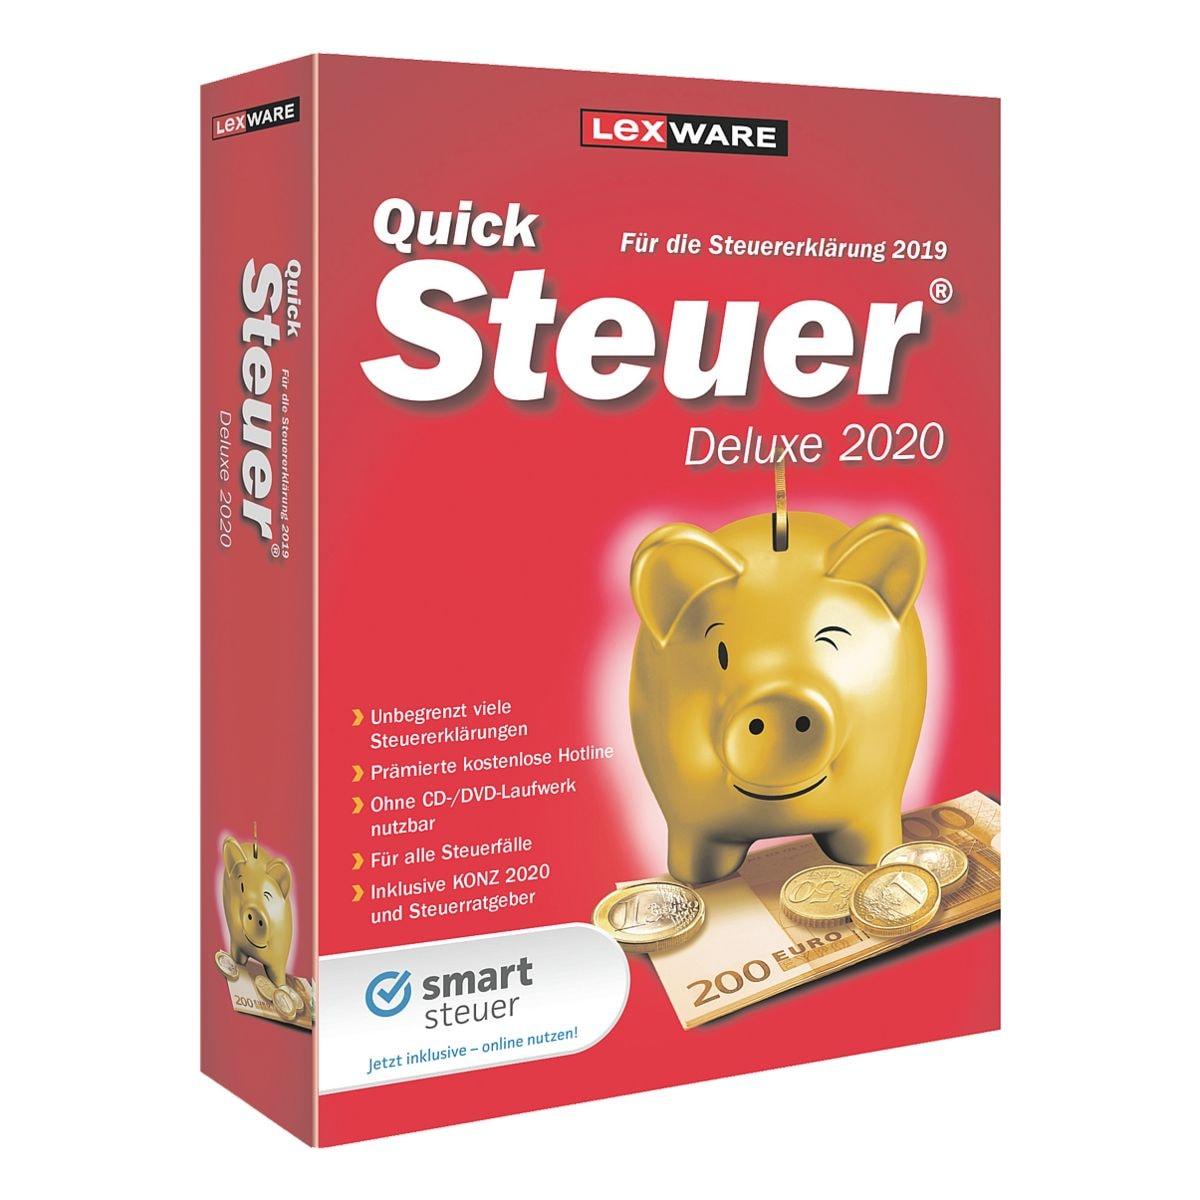 Kaufmännische Software Lexware QuickSteuer Deluxe 2020 Deluxe